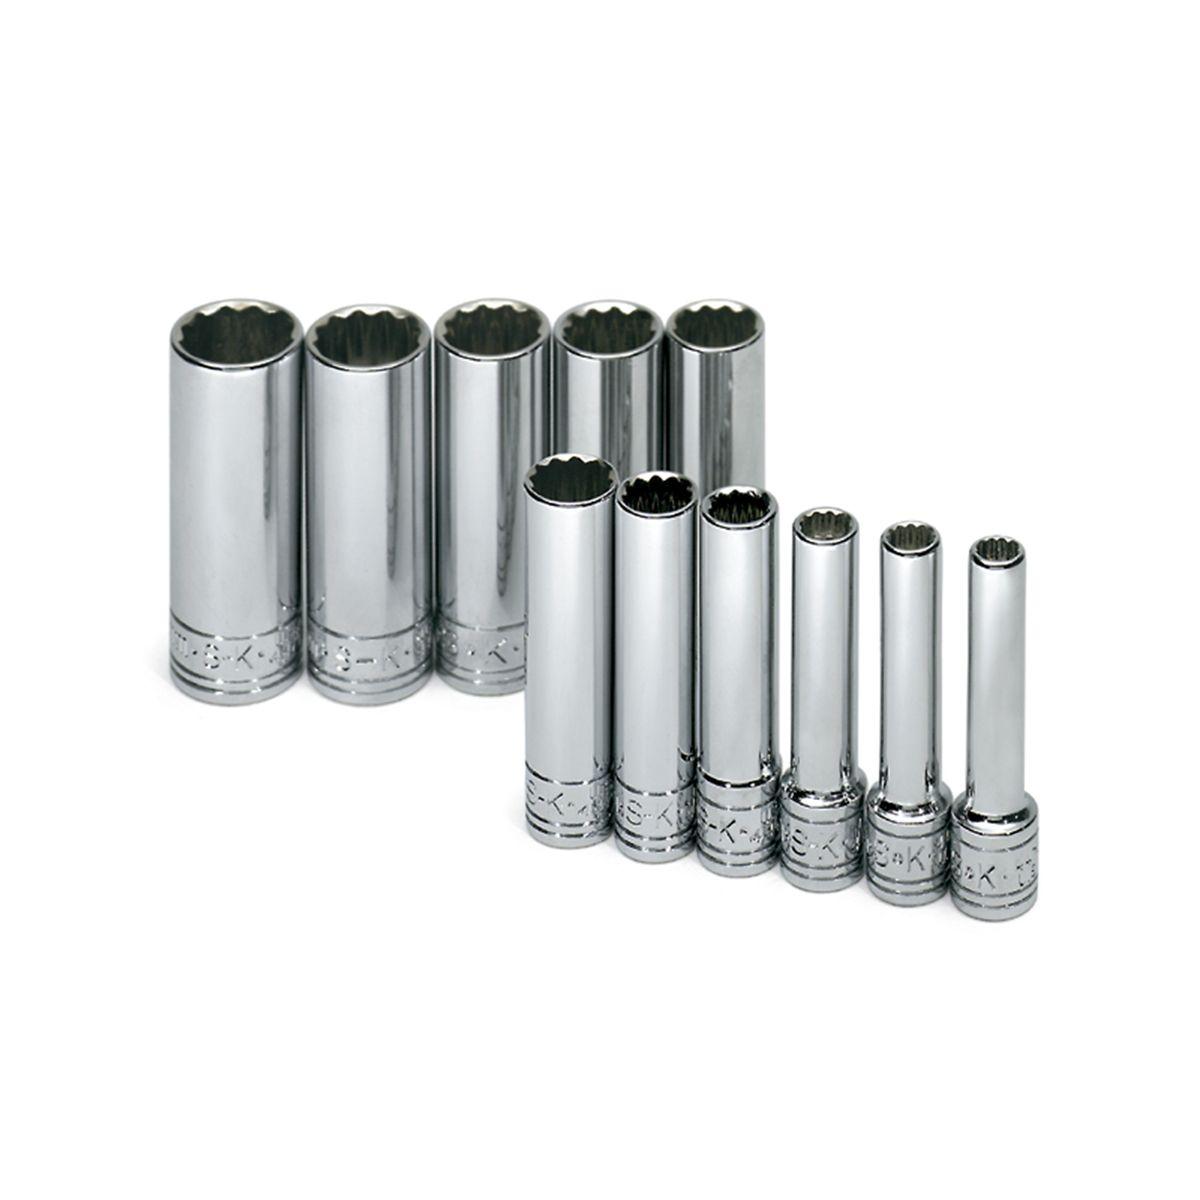 SK Hand Tool 91824 1//4-Inch Drive Semi-Deep Socket Set 24-Piece